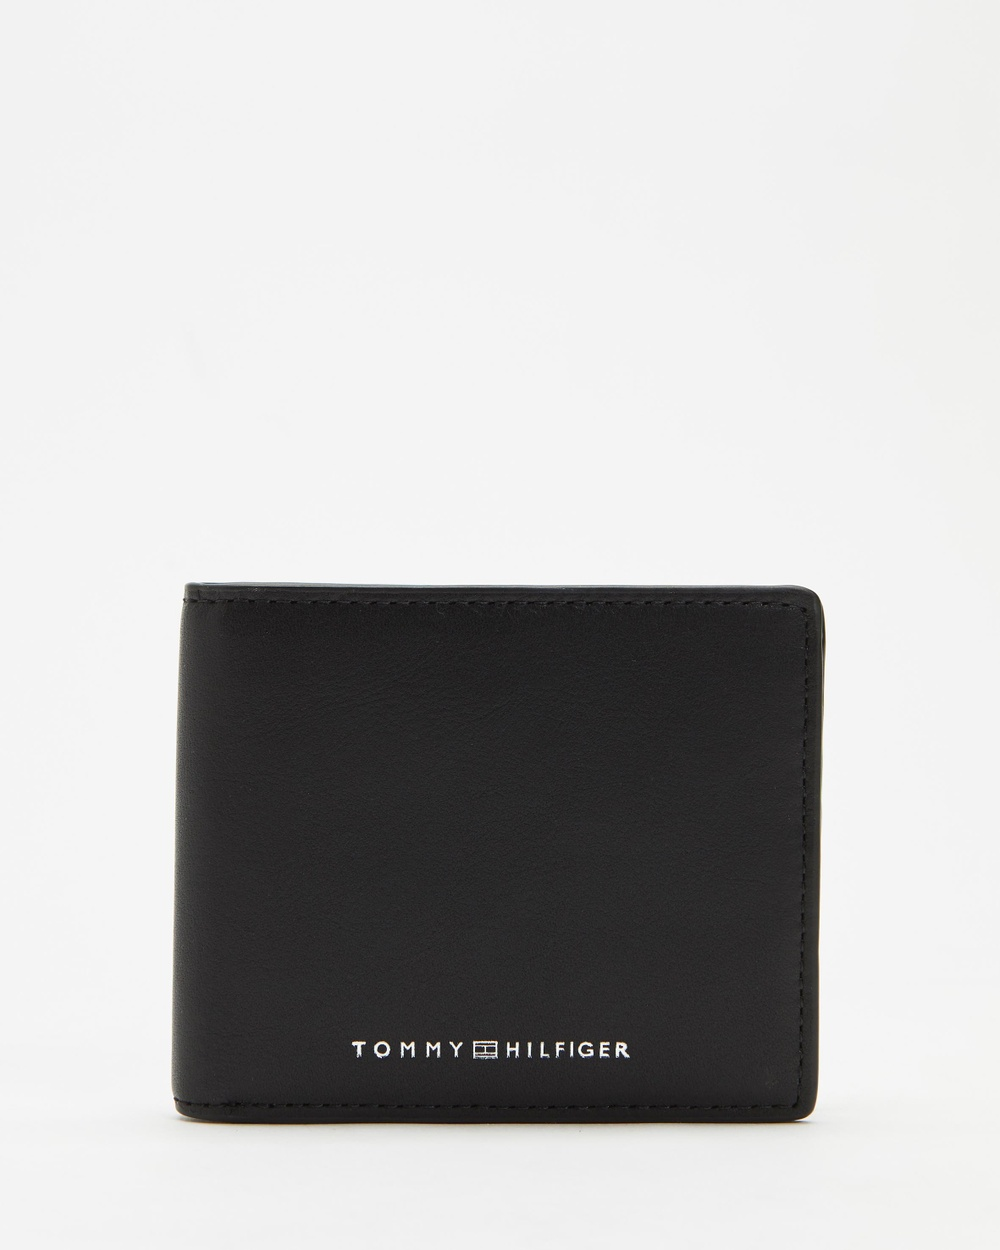 Tommy Hilfiger Metro Mini Credit Card Wallet Wallets Black Australia